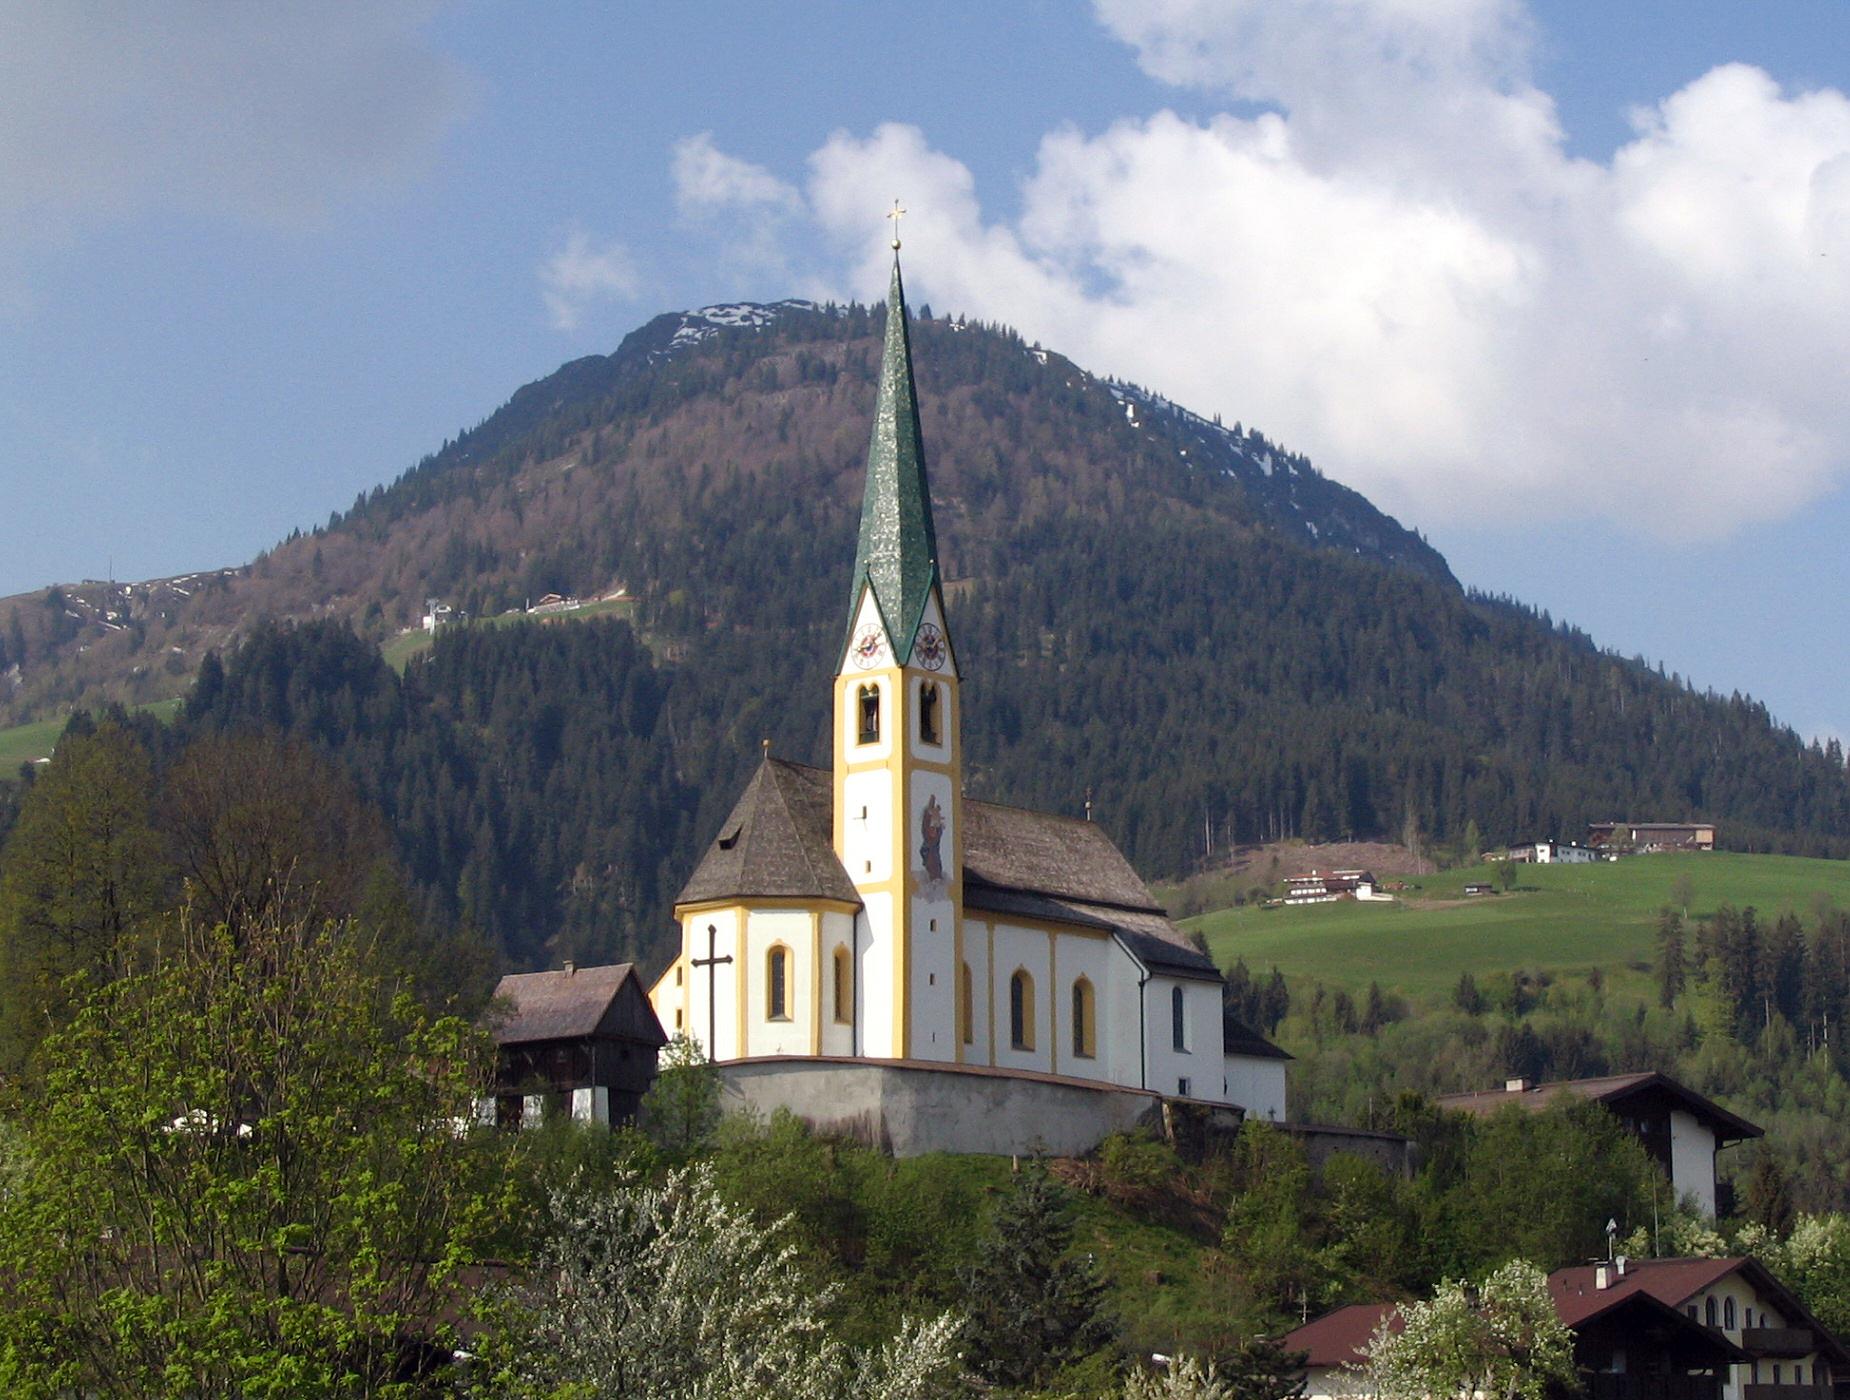 Kirchberg in Tirol Austria  City pictures : Kirchberg in Tirol.Pfarrkirche Wikipedia, the free ...